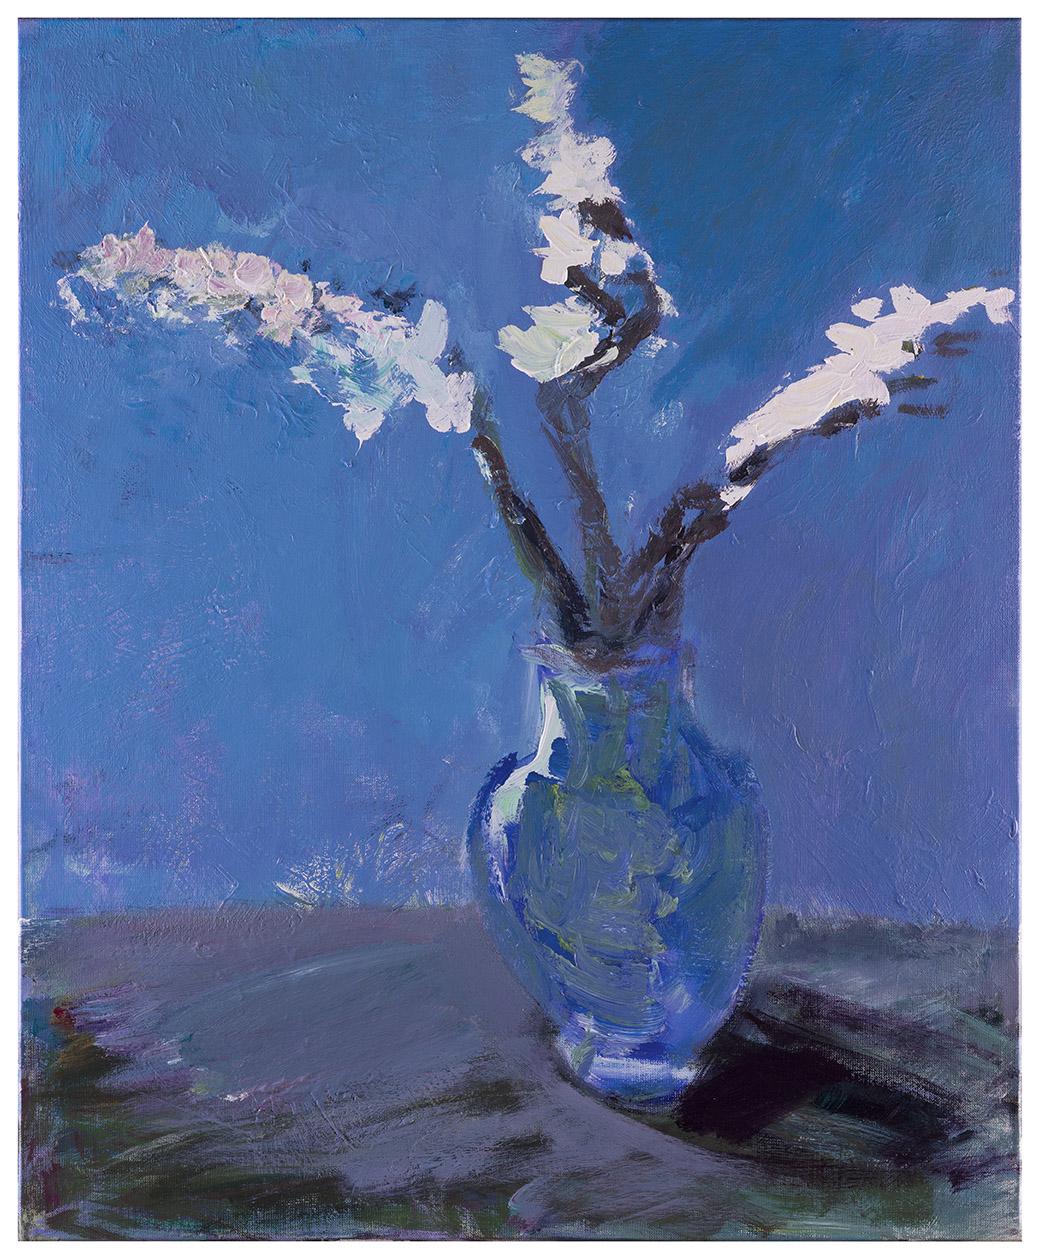 Tableau de 3 branches en fleur (par Patrice Giorda)